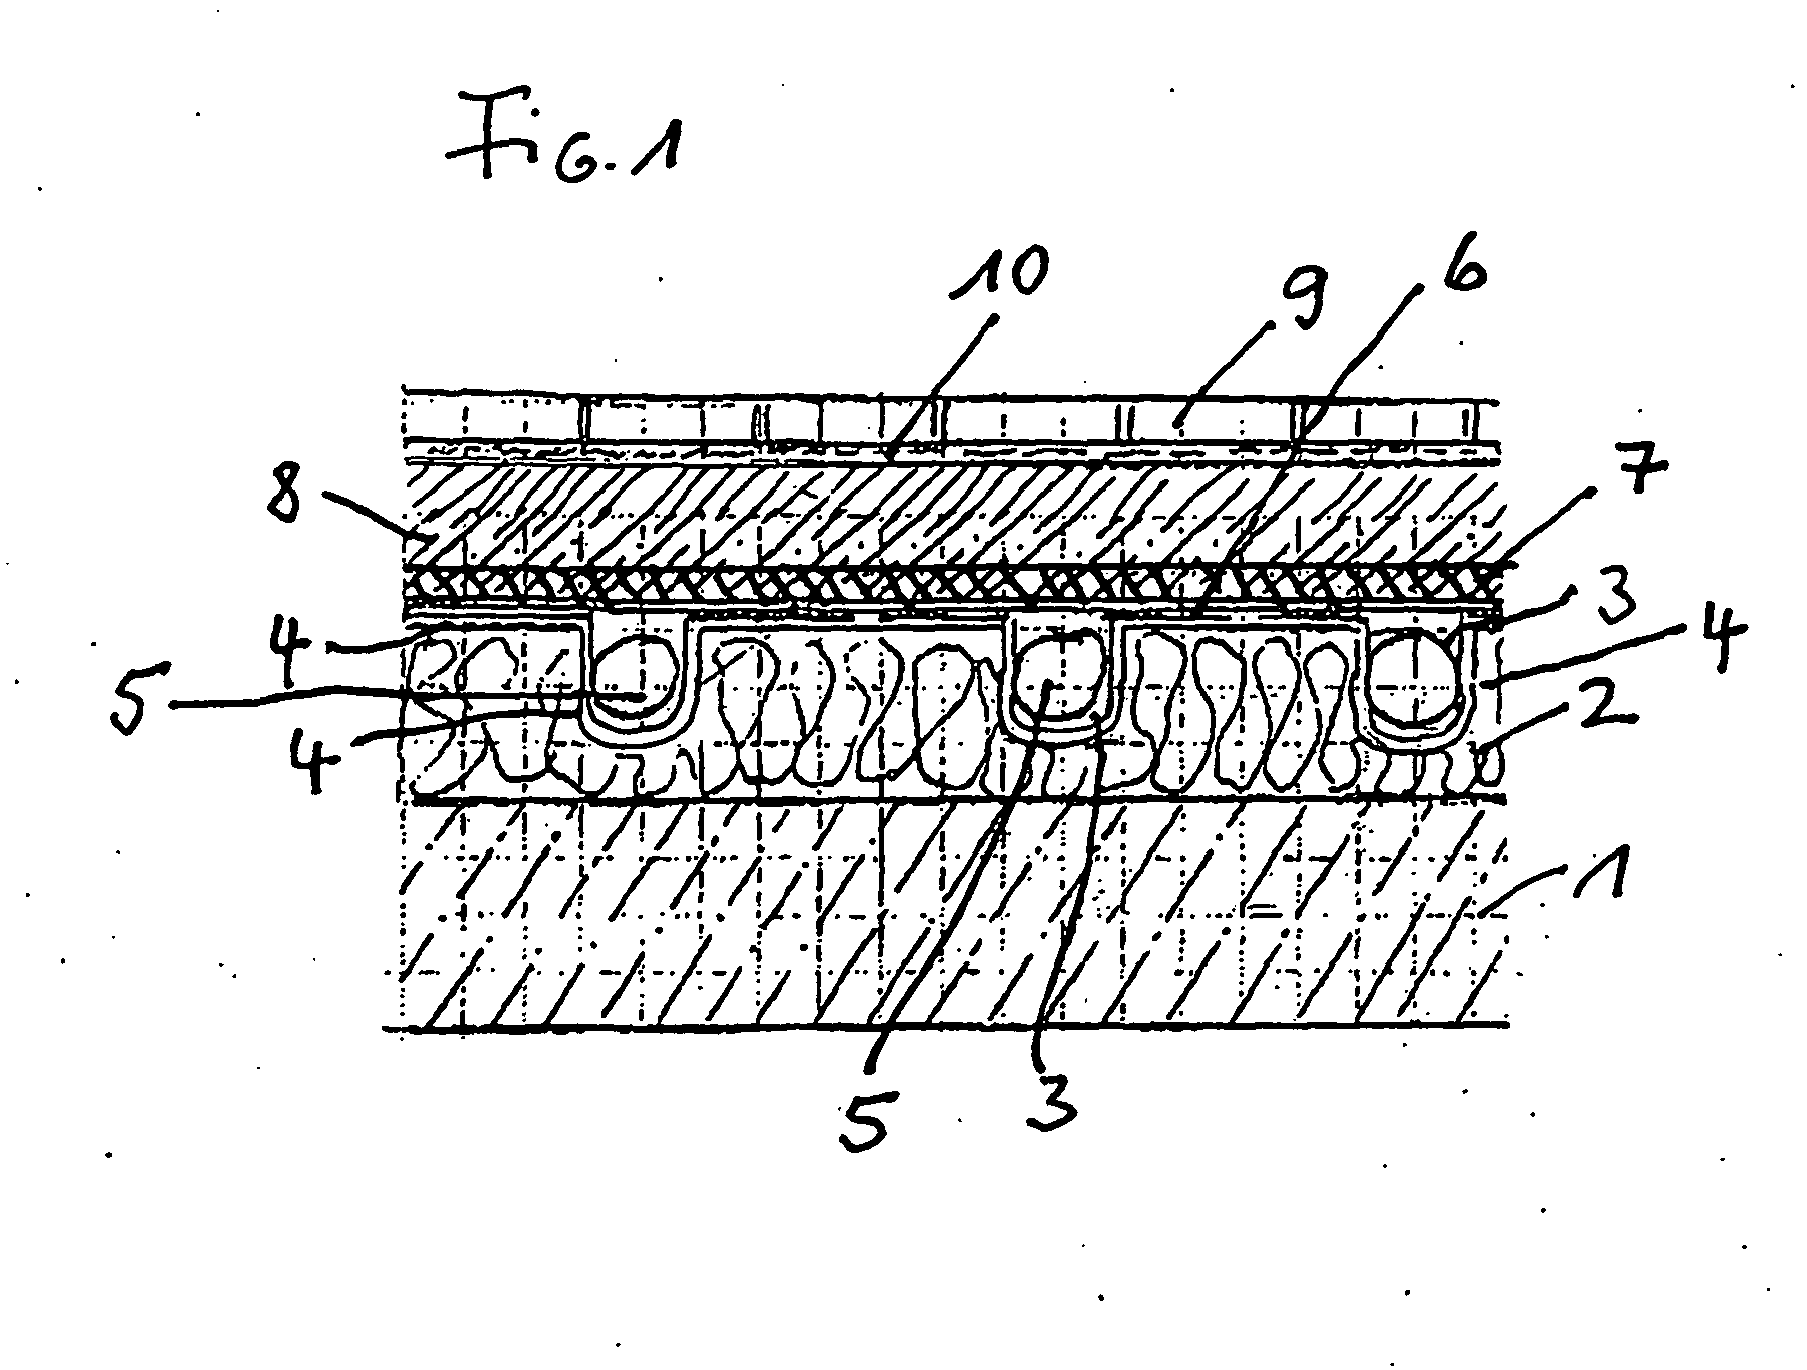 patent ep1905920b1 fu boden mit fu bodenheizung google patents. Black Bedroom Furniture Sets. Home Design Ideas